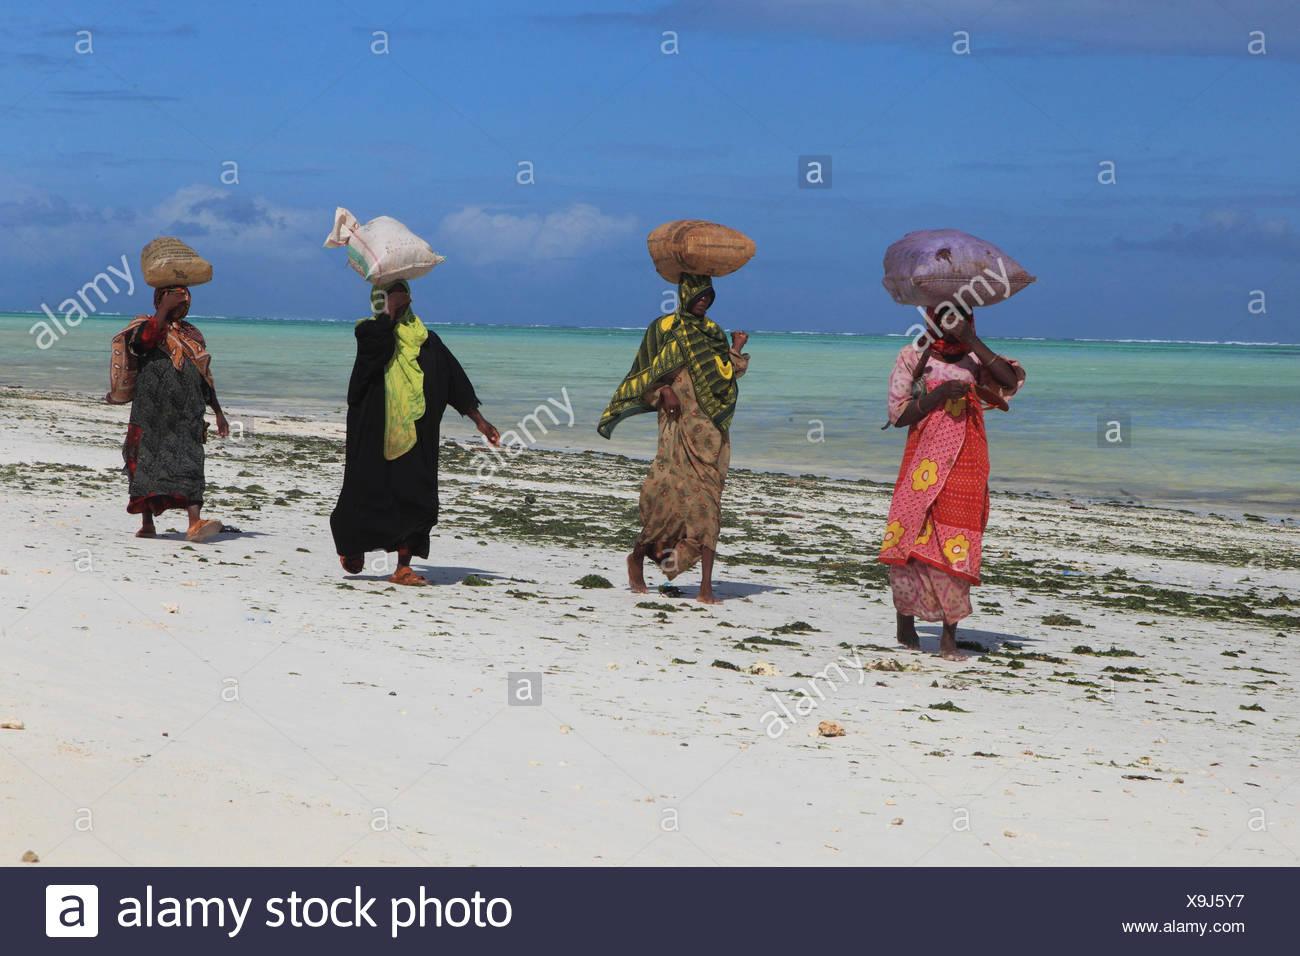 women carrying sacks with seaweeds on their heads, Tanzania, Sansibar - Stock Image